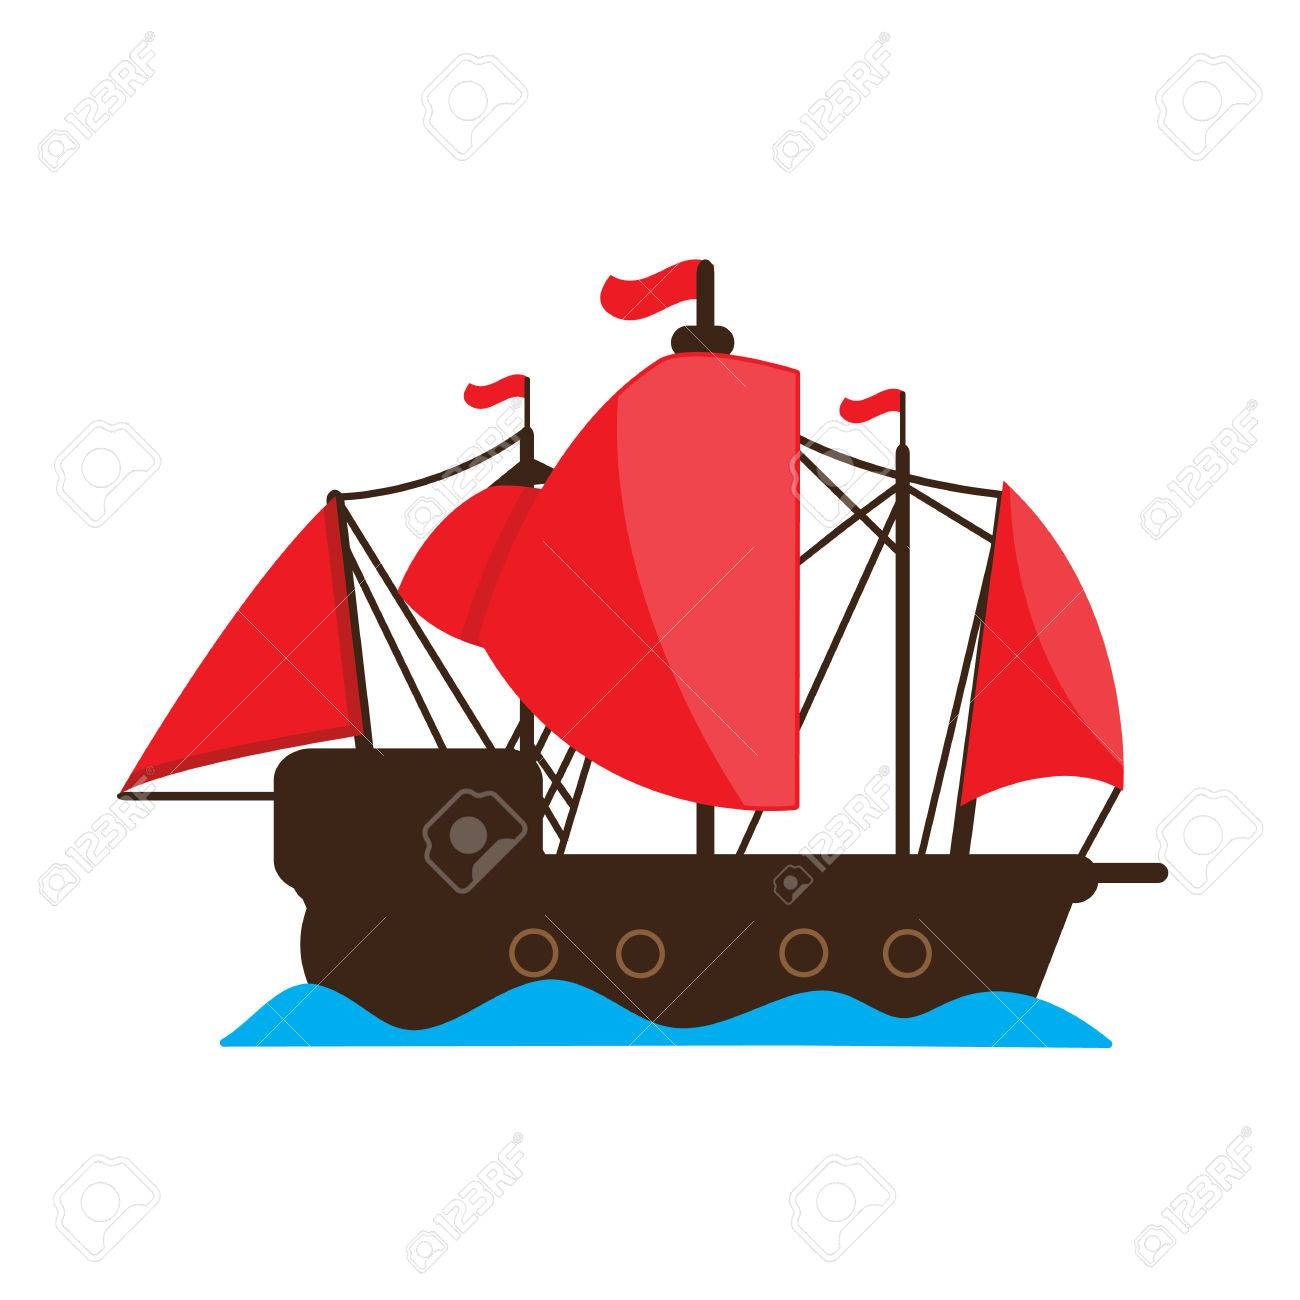 chinese junk ship vector cartoon design royalty free cliparts rh 123rf com ship victory 1 ship victory